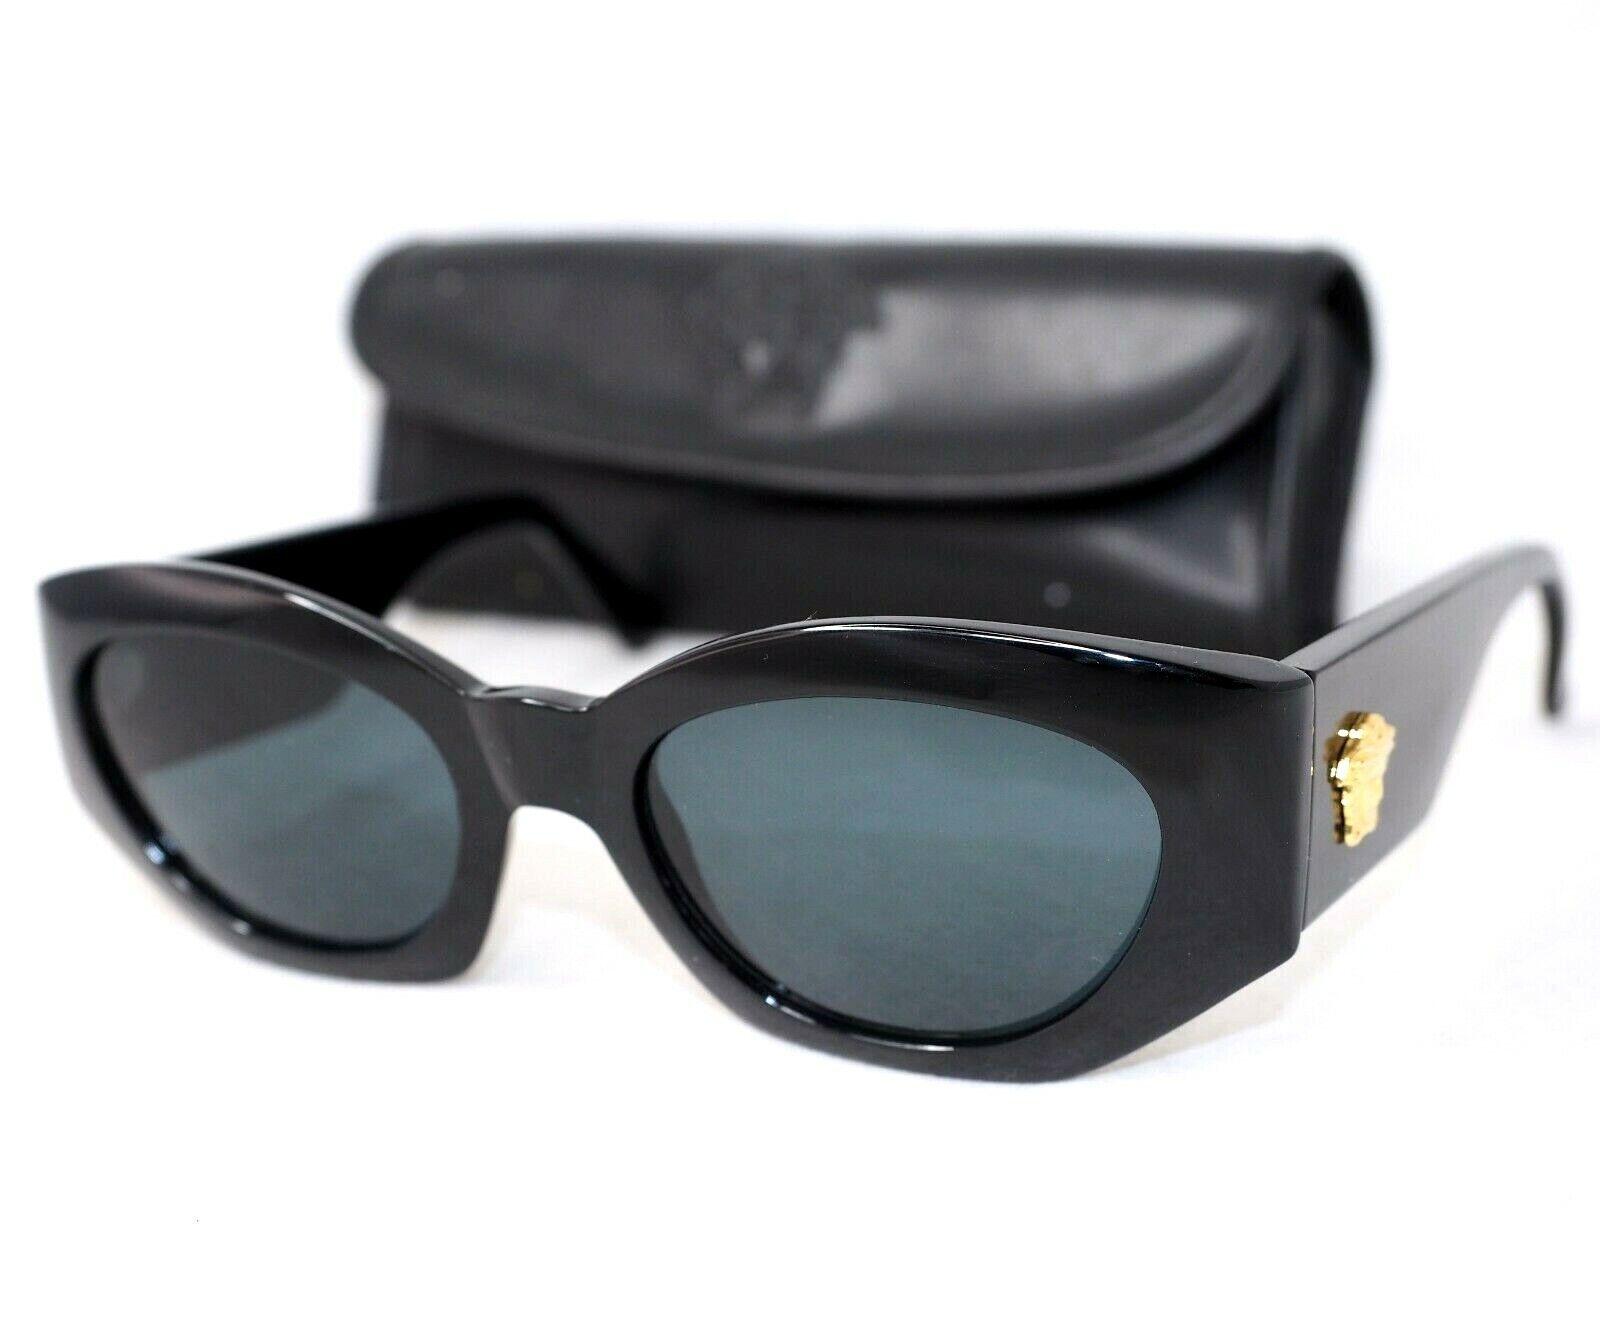 GIANNI VERSACE Sunglasses 420 852 black gray gold medusa head baroque vintage